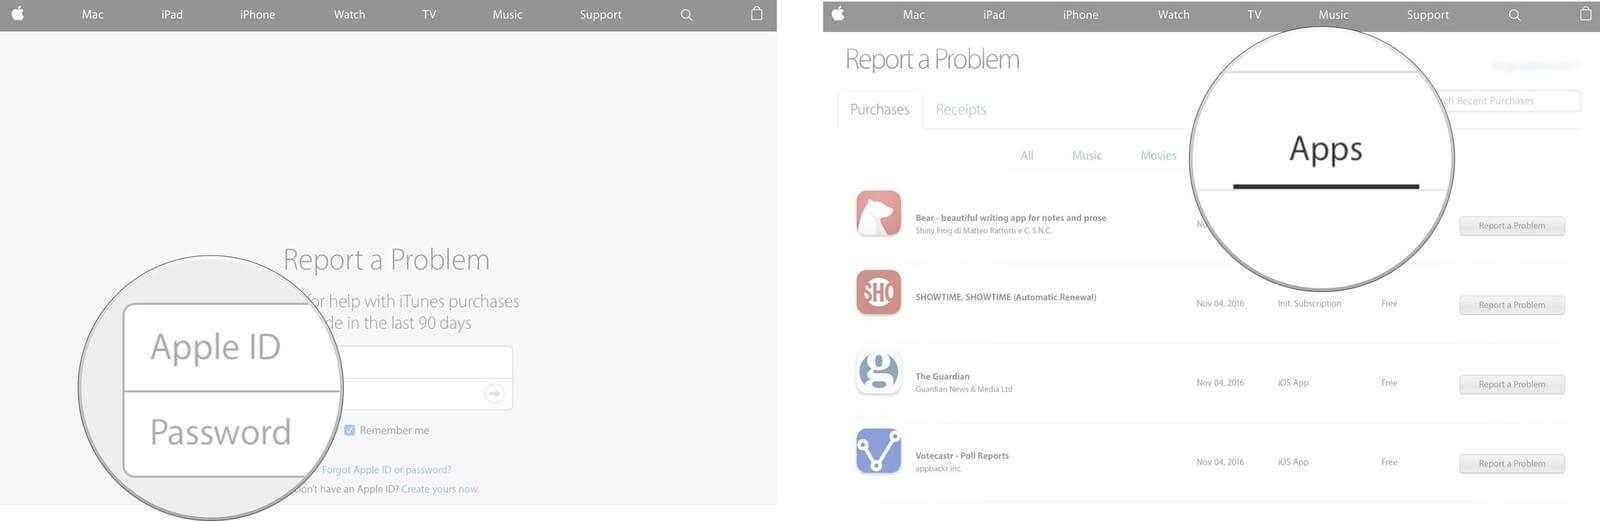 Reembolso App Store